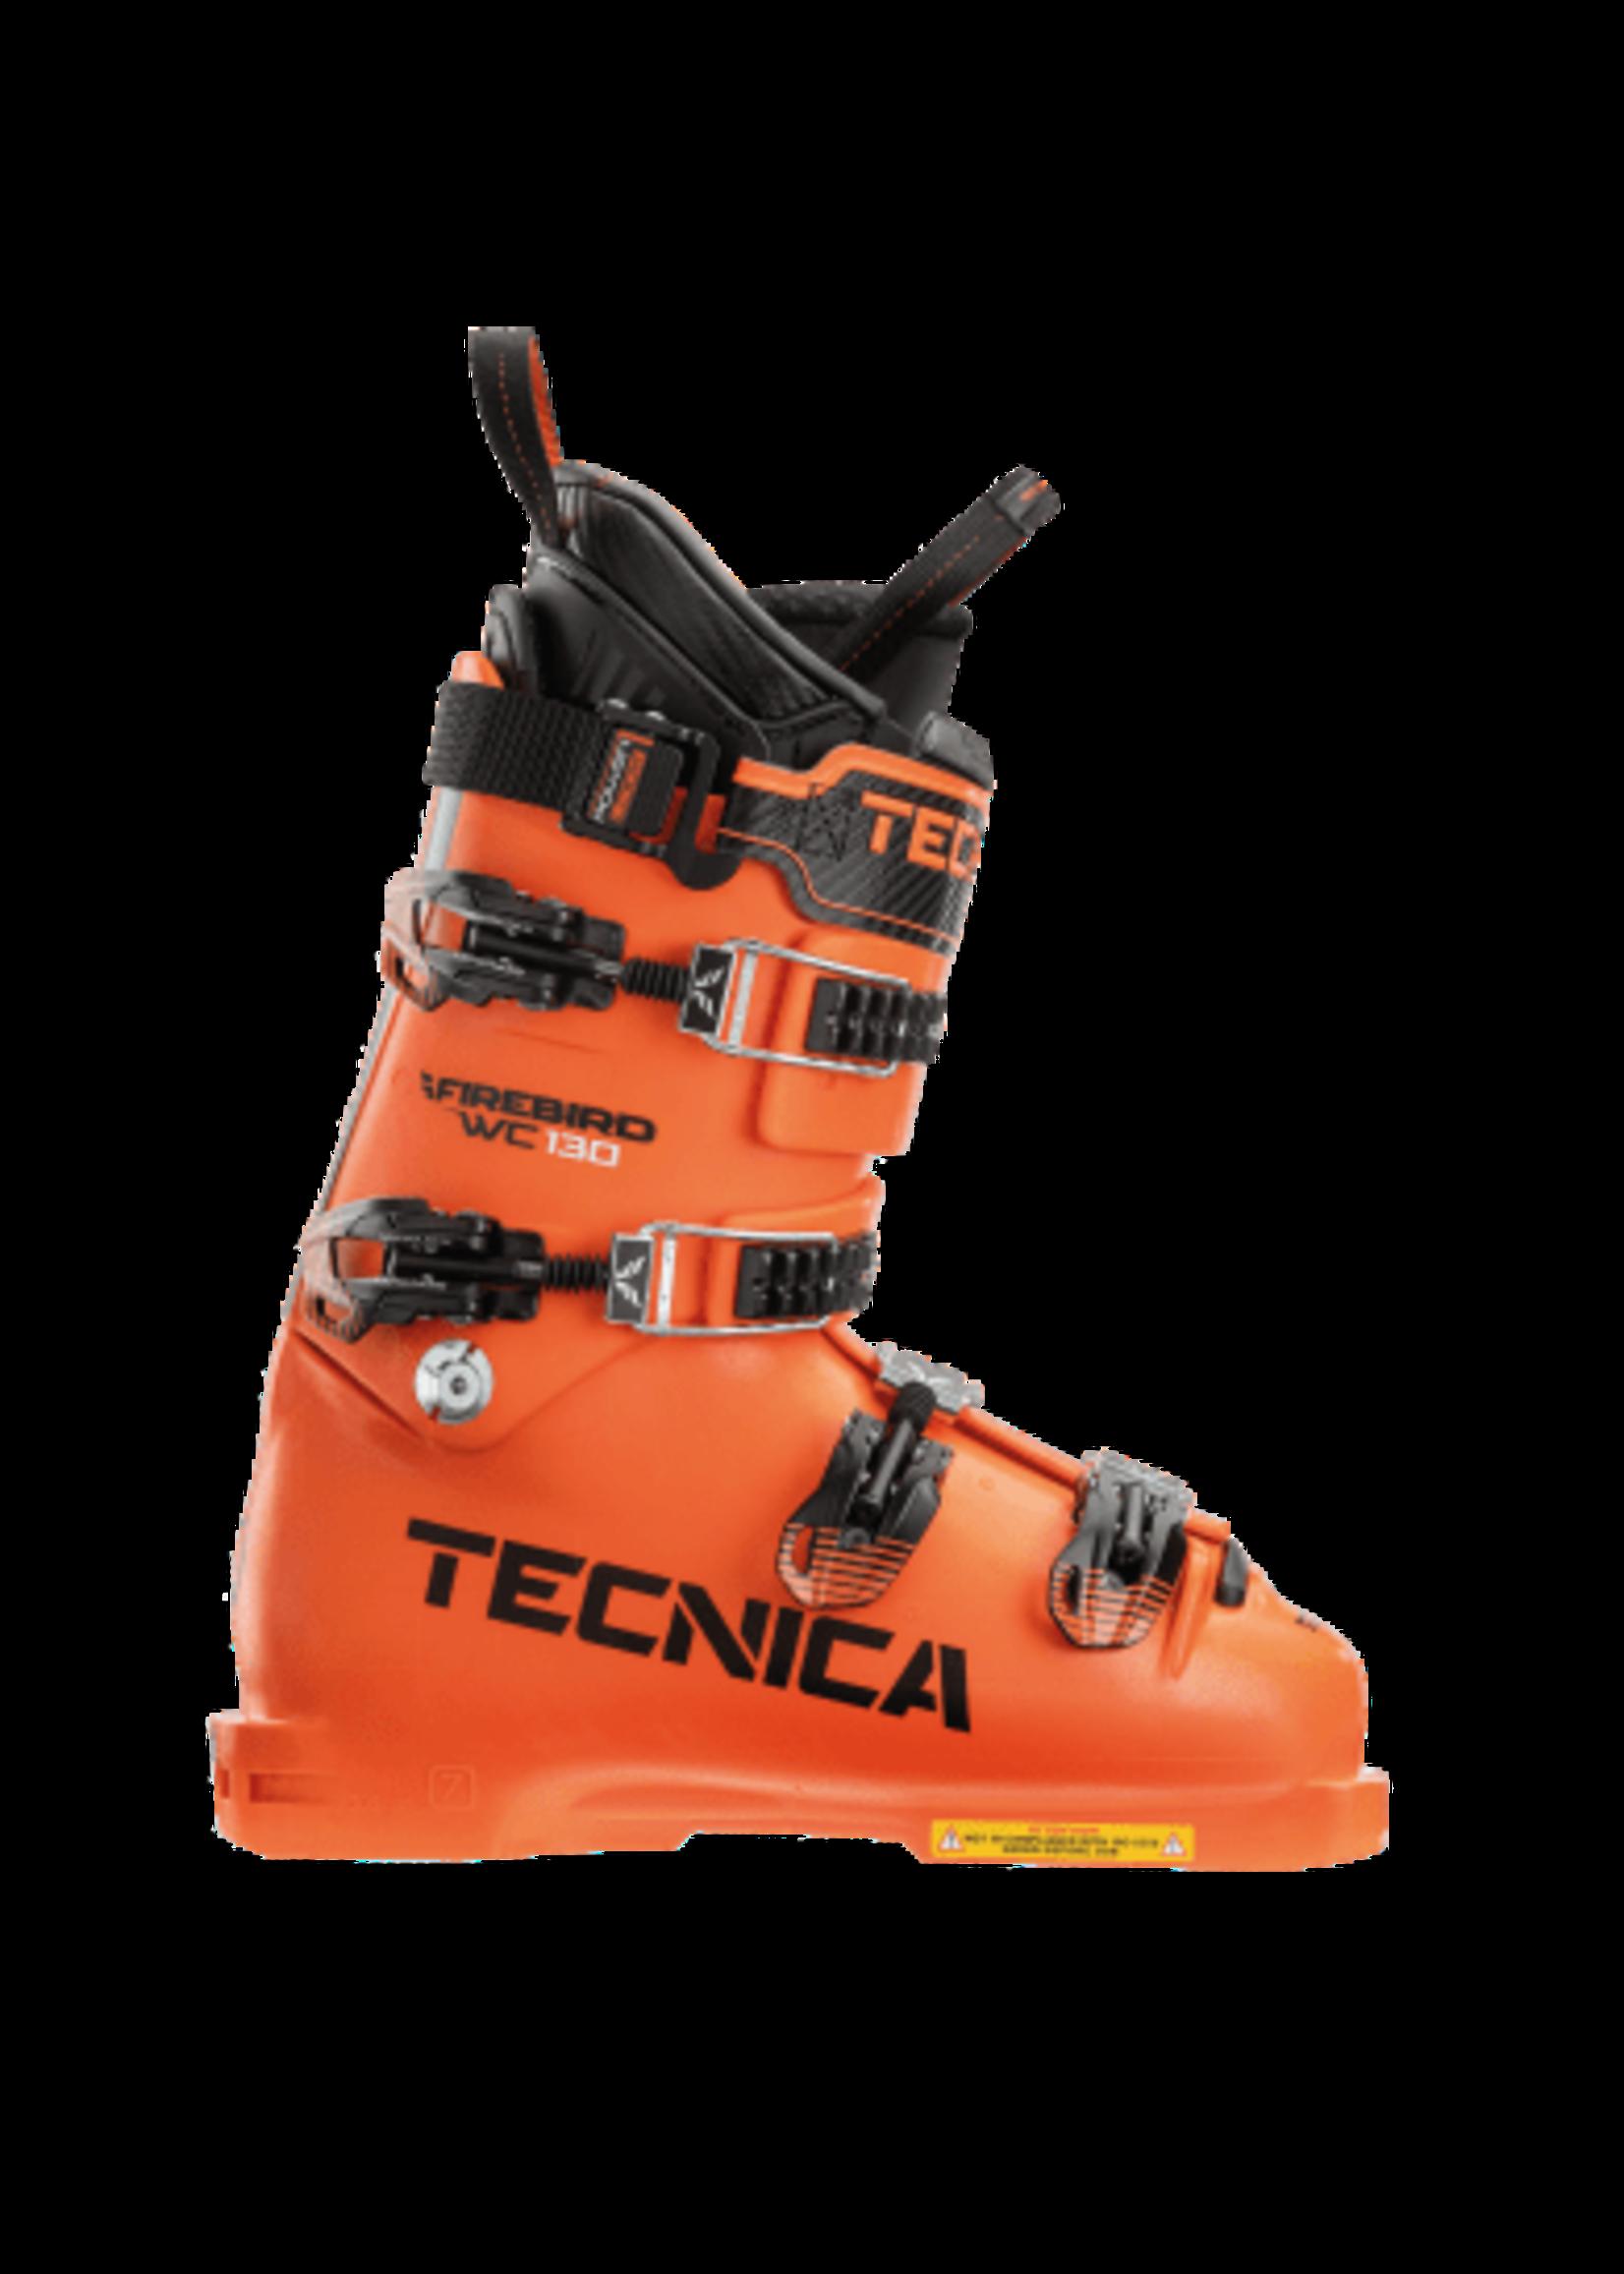 Tecnica Ski Boot Race Firebird WC 130